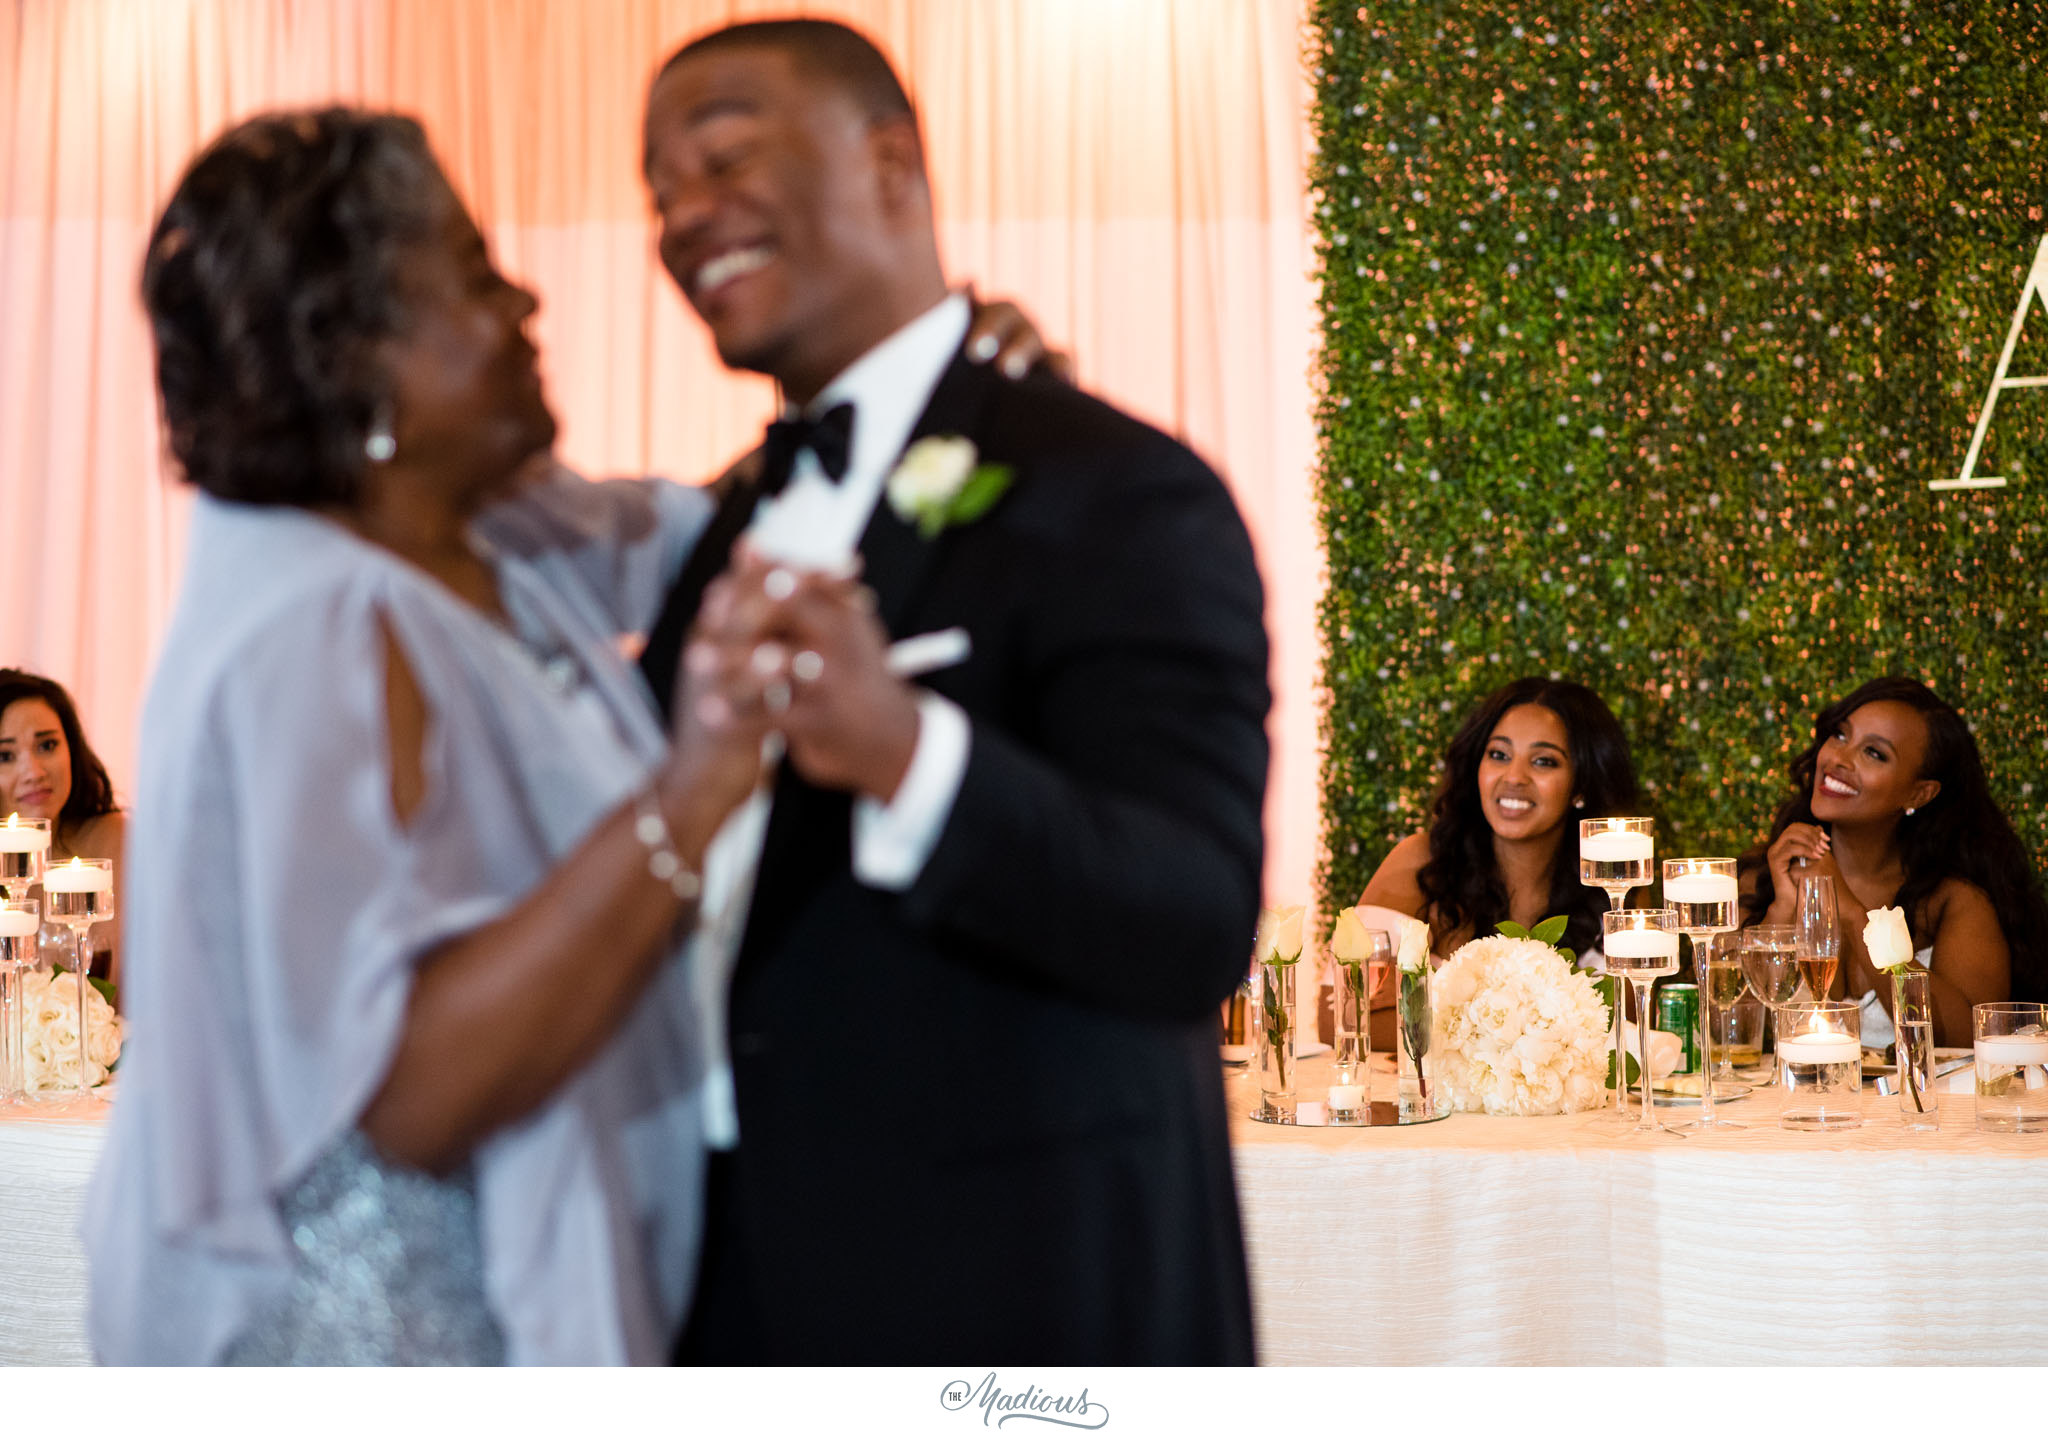 nmwa+wedding,+women+in+the+arts+wedding,+ethiopian+wedding,+dc+wedding+0203.jpg